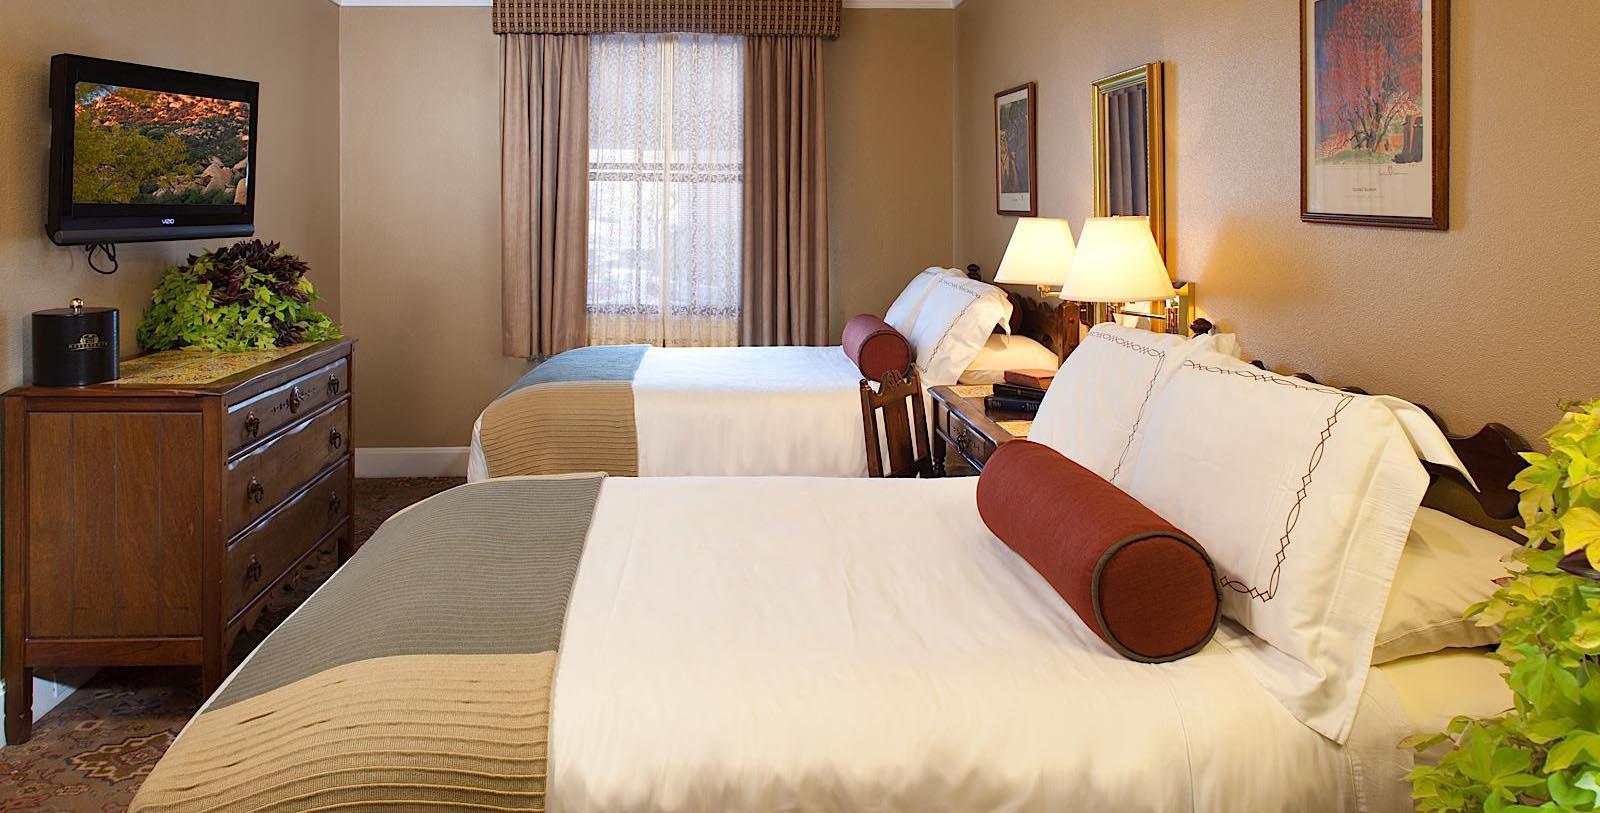 Image of guestroom Hassayampa Inn, 1927, Member of Historic Hotels of America, in Prescott, Arizona, Location Map